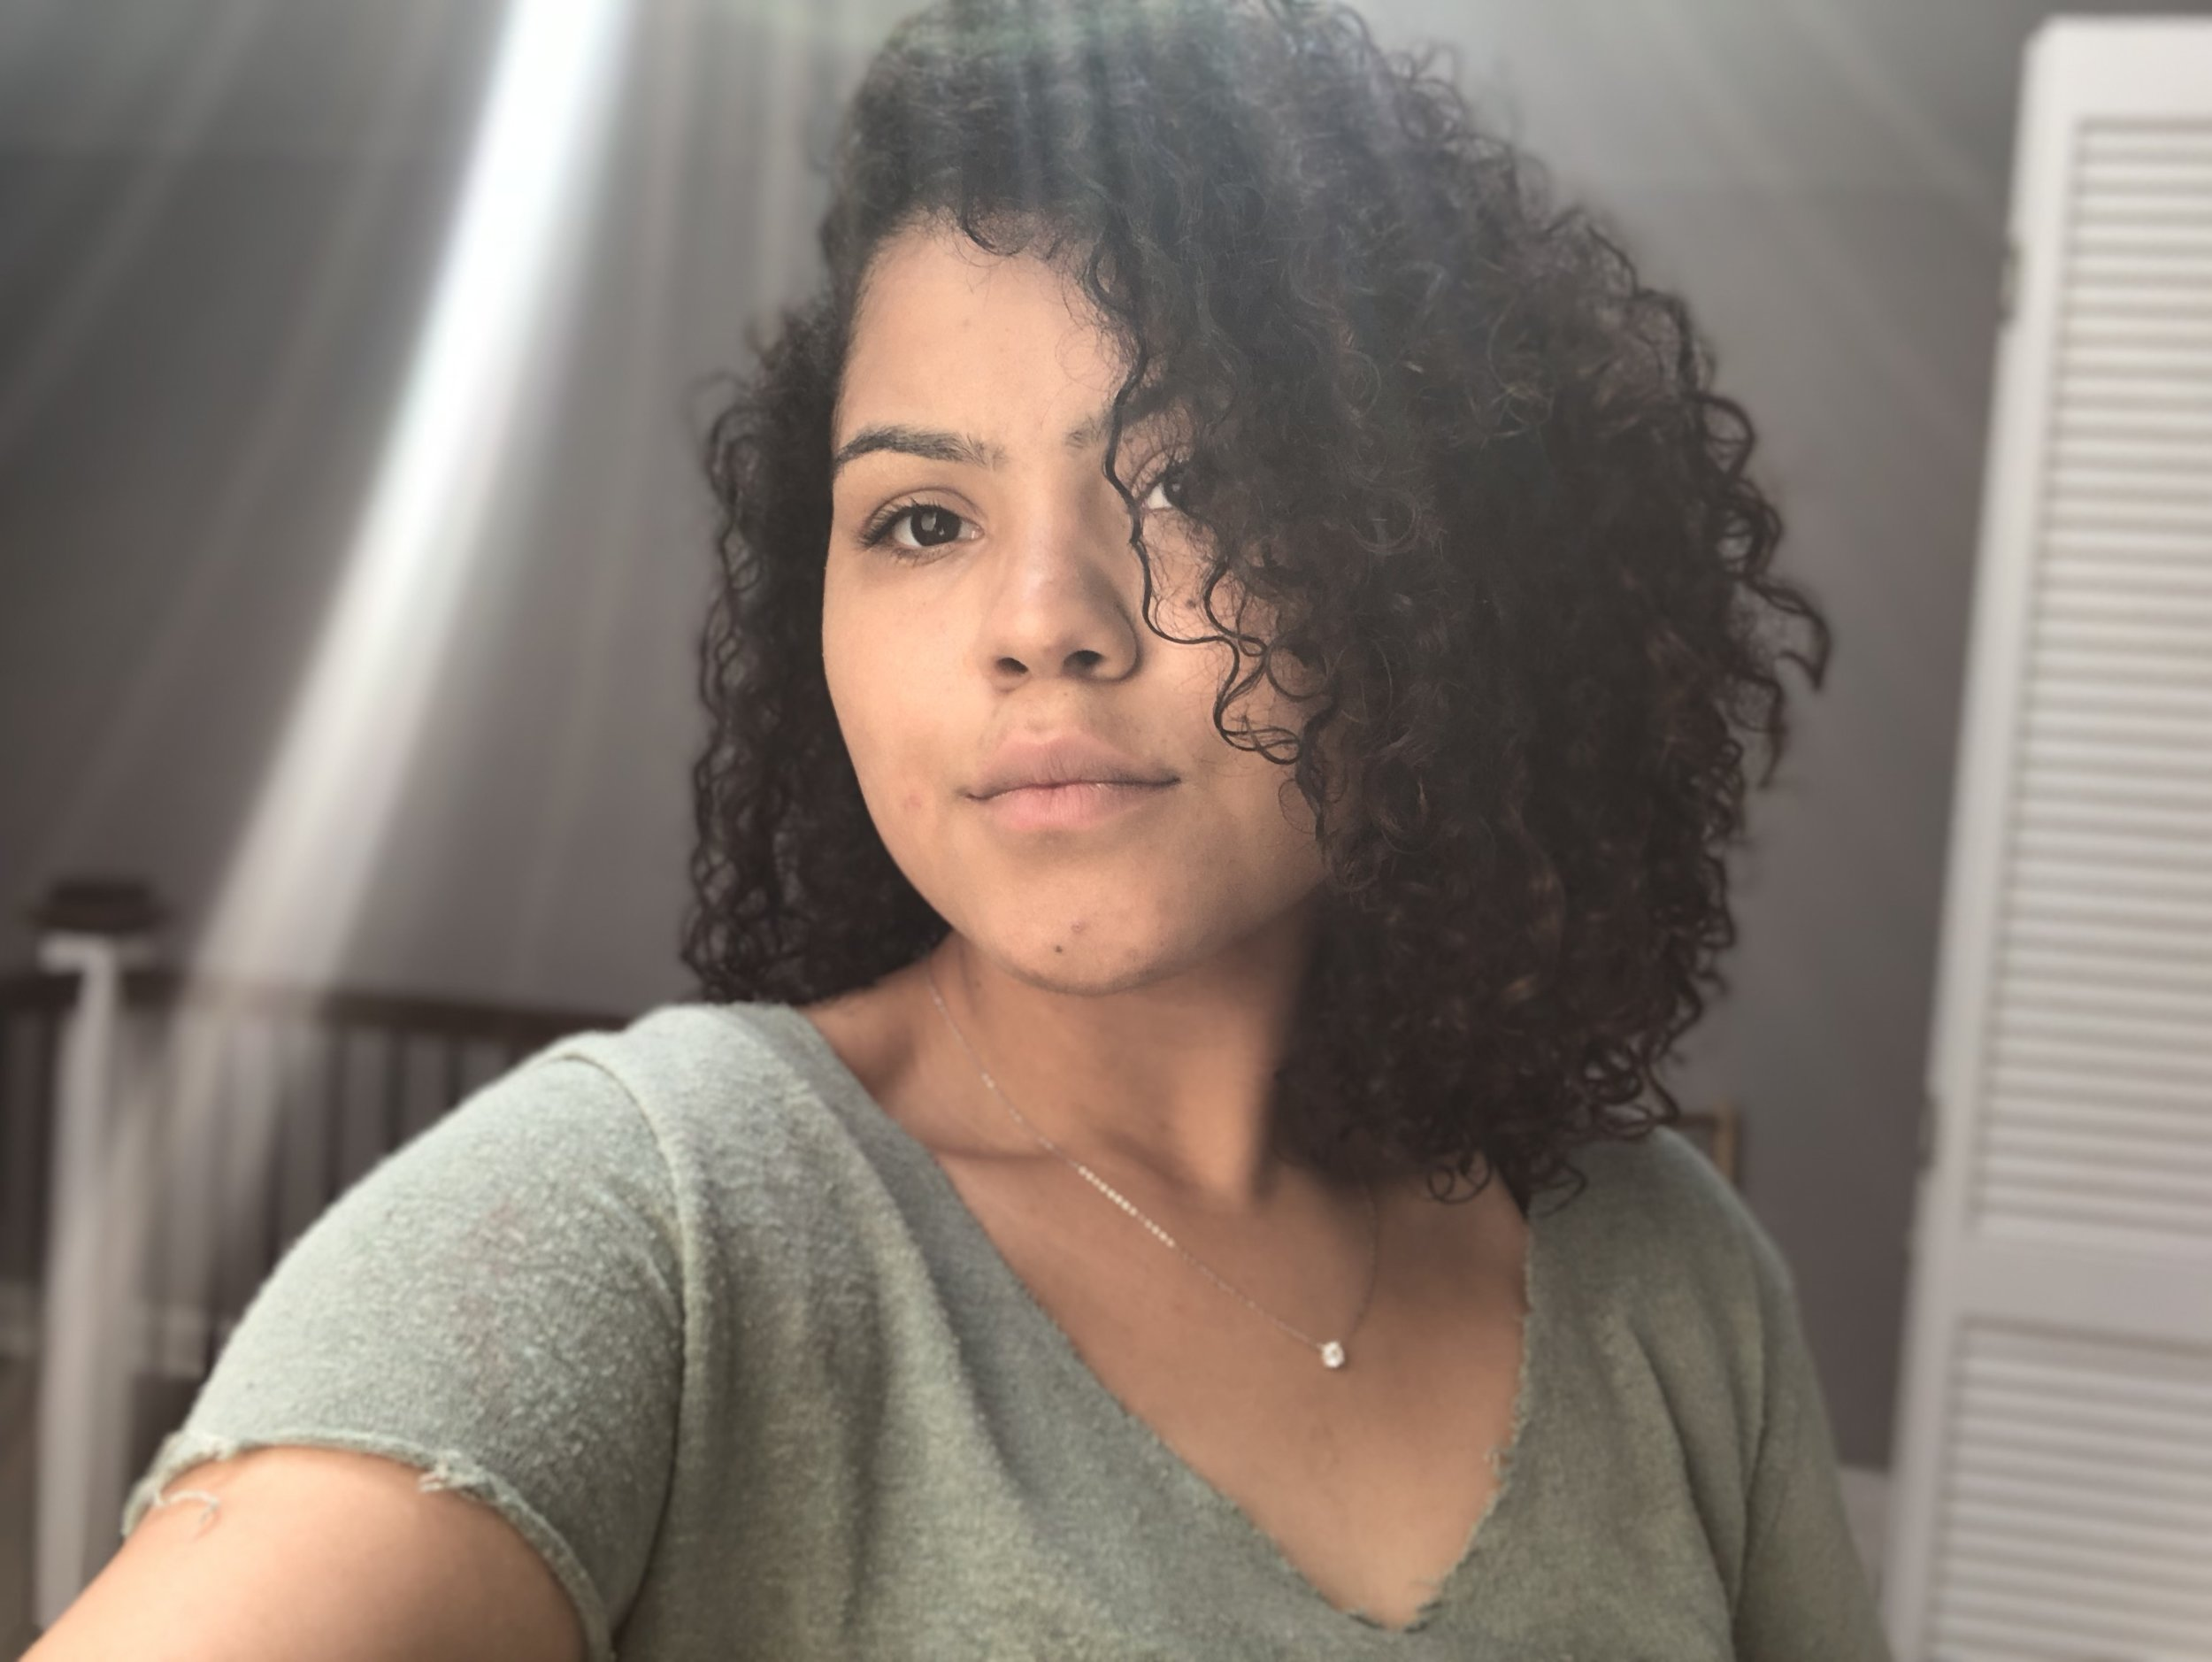 Afro Latina Woman in STEM Carla.JPG